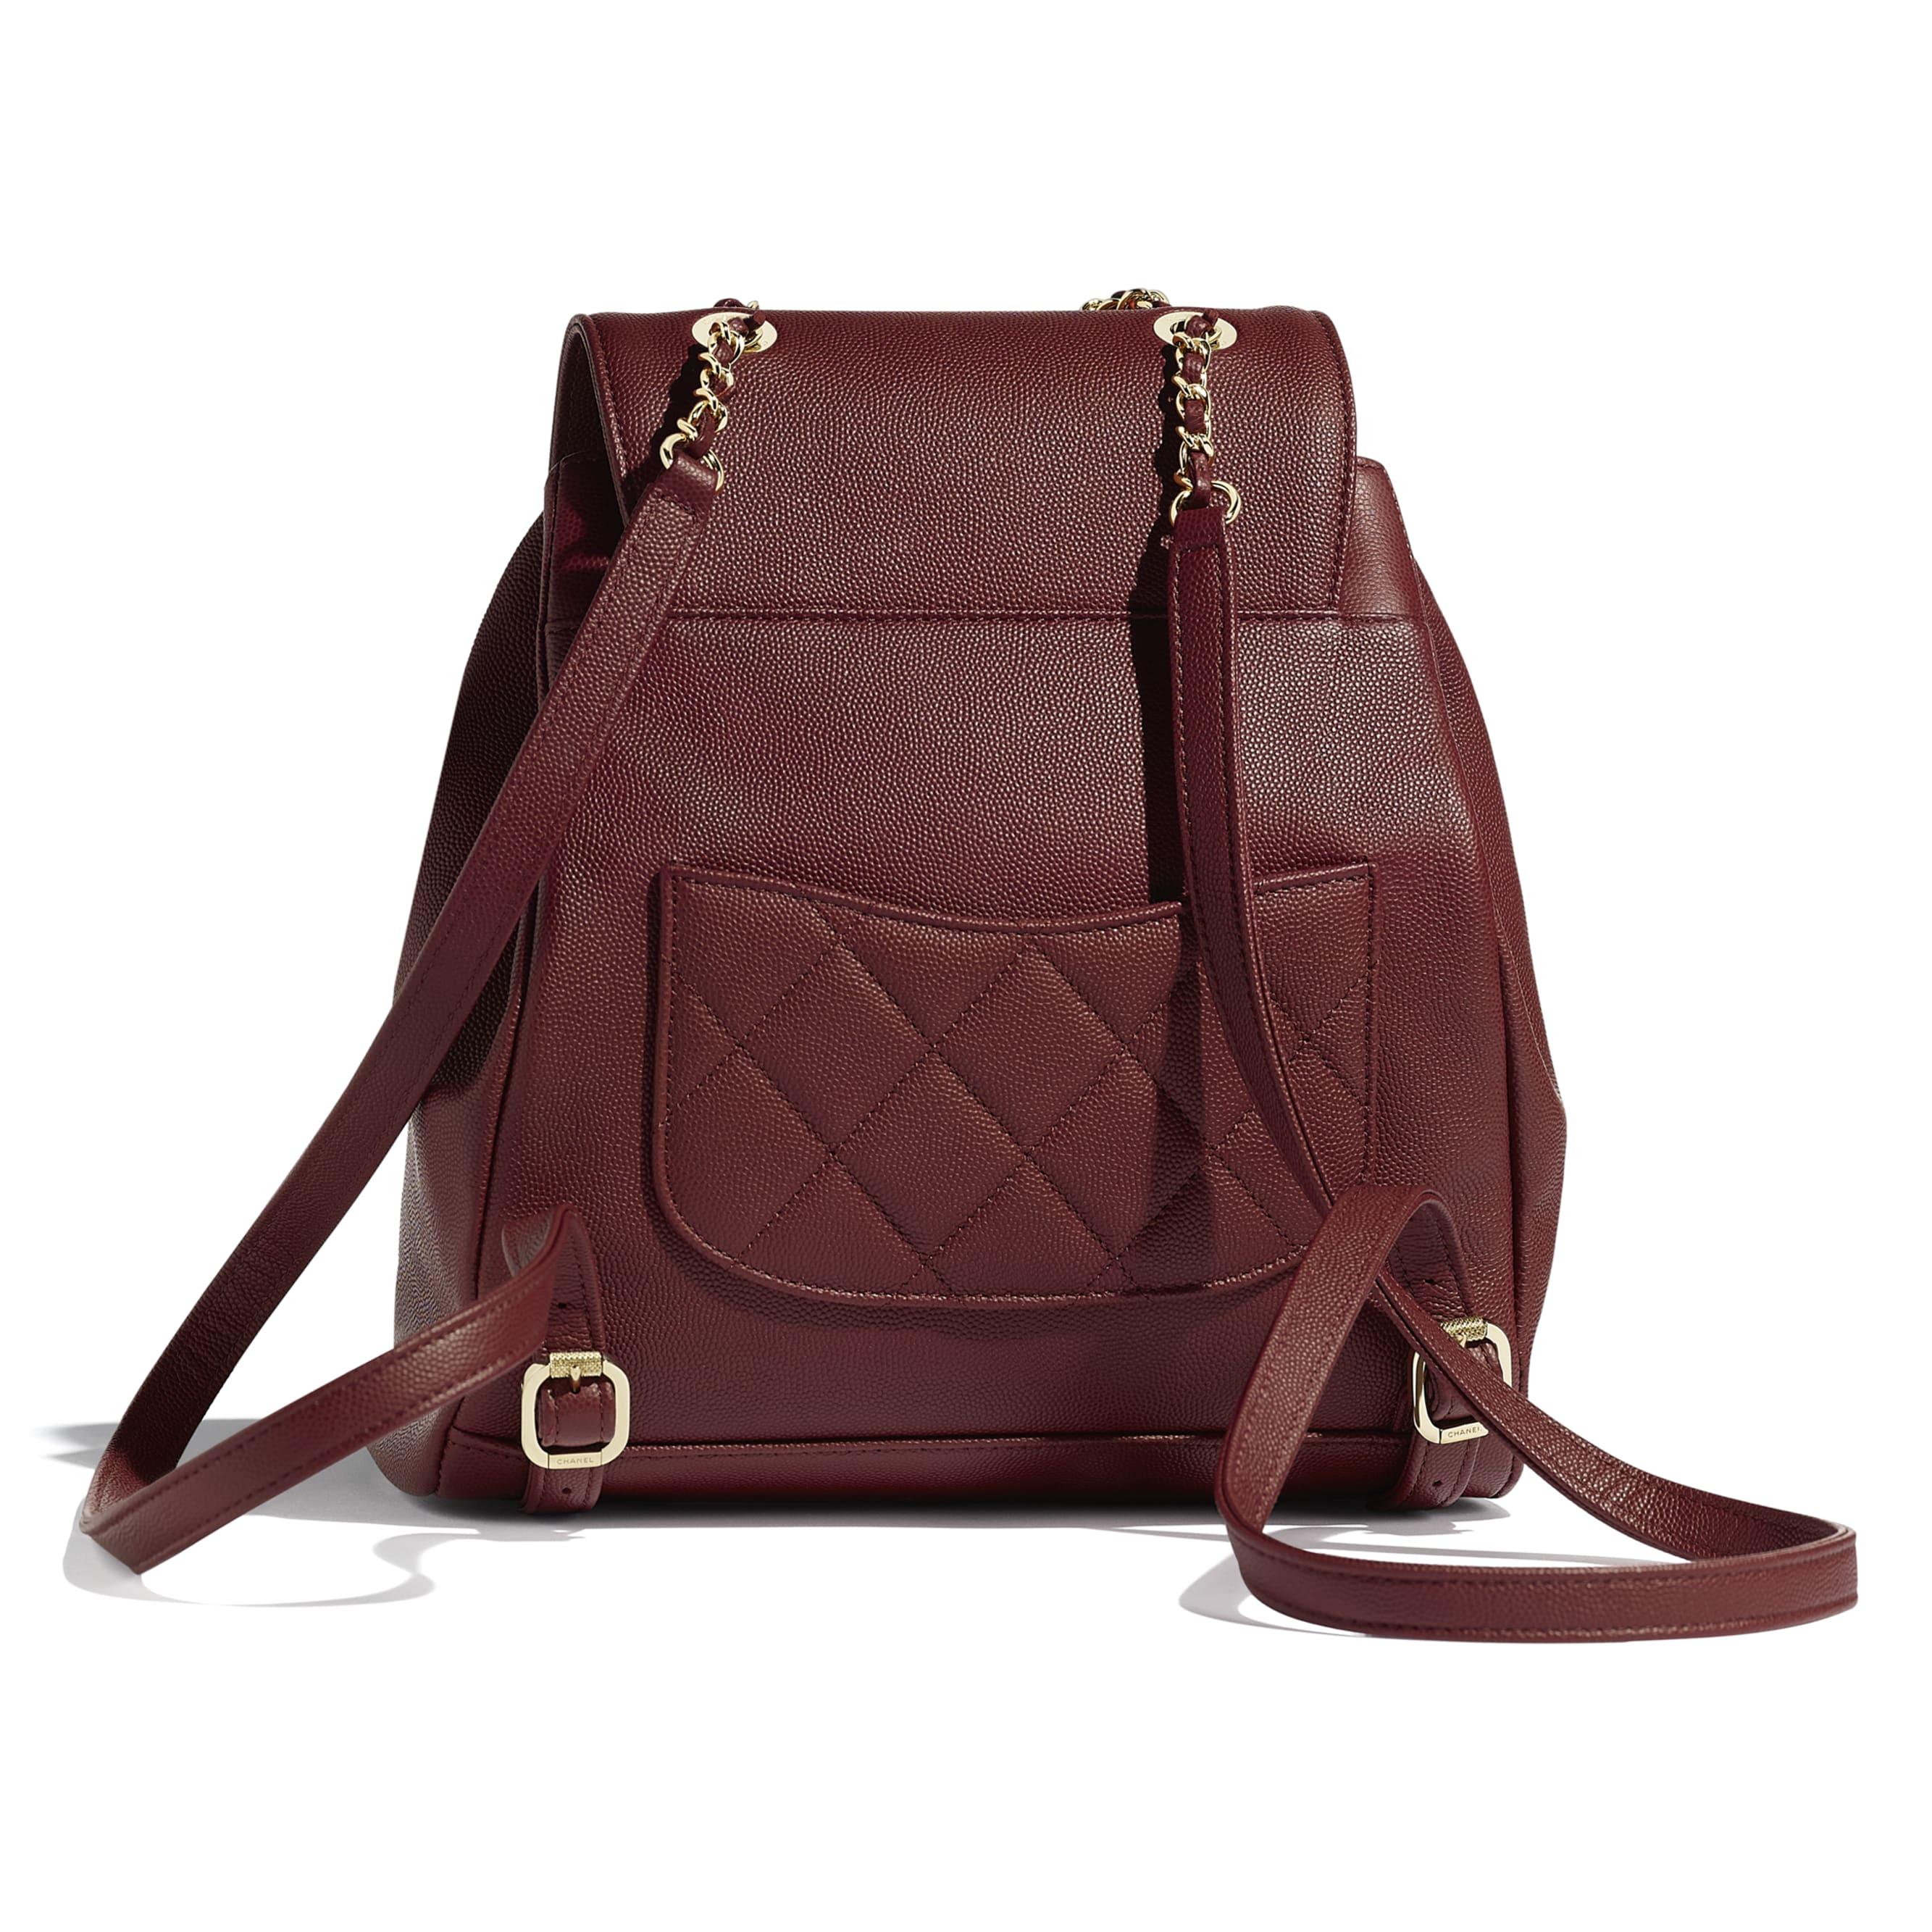 Backpack - Burgundy - Grained Calfskin & Gold-Tone Metal - Alternative view - see standard sized version